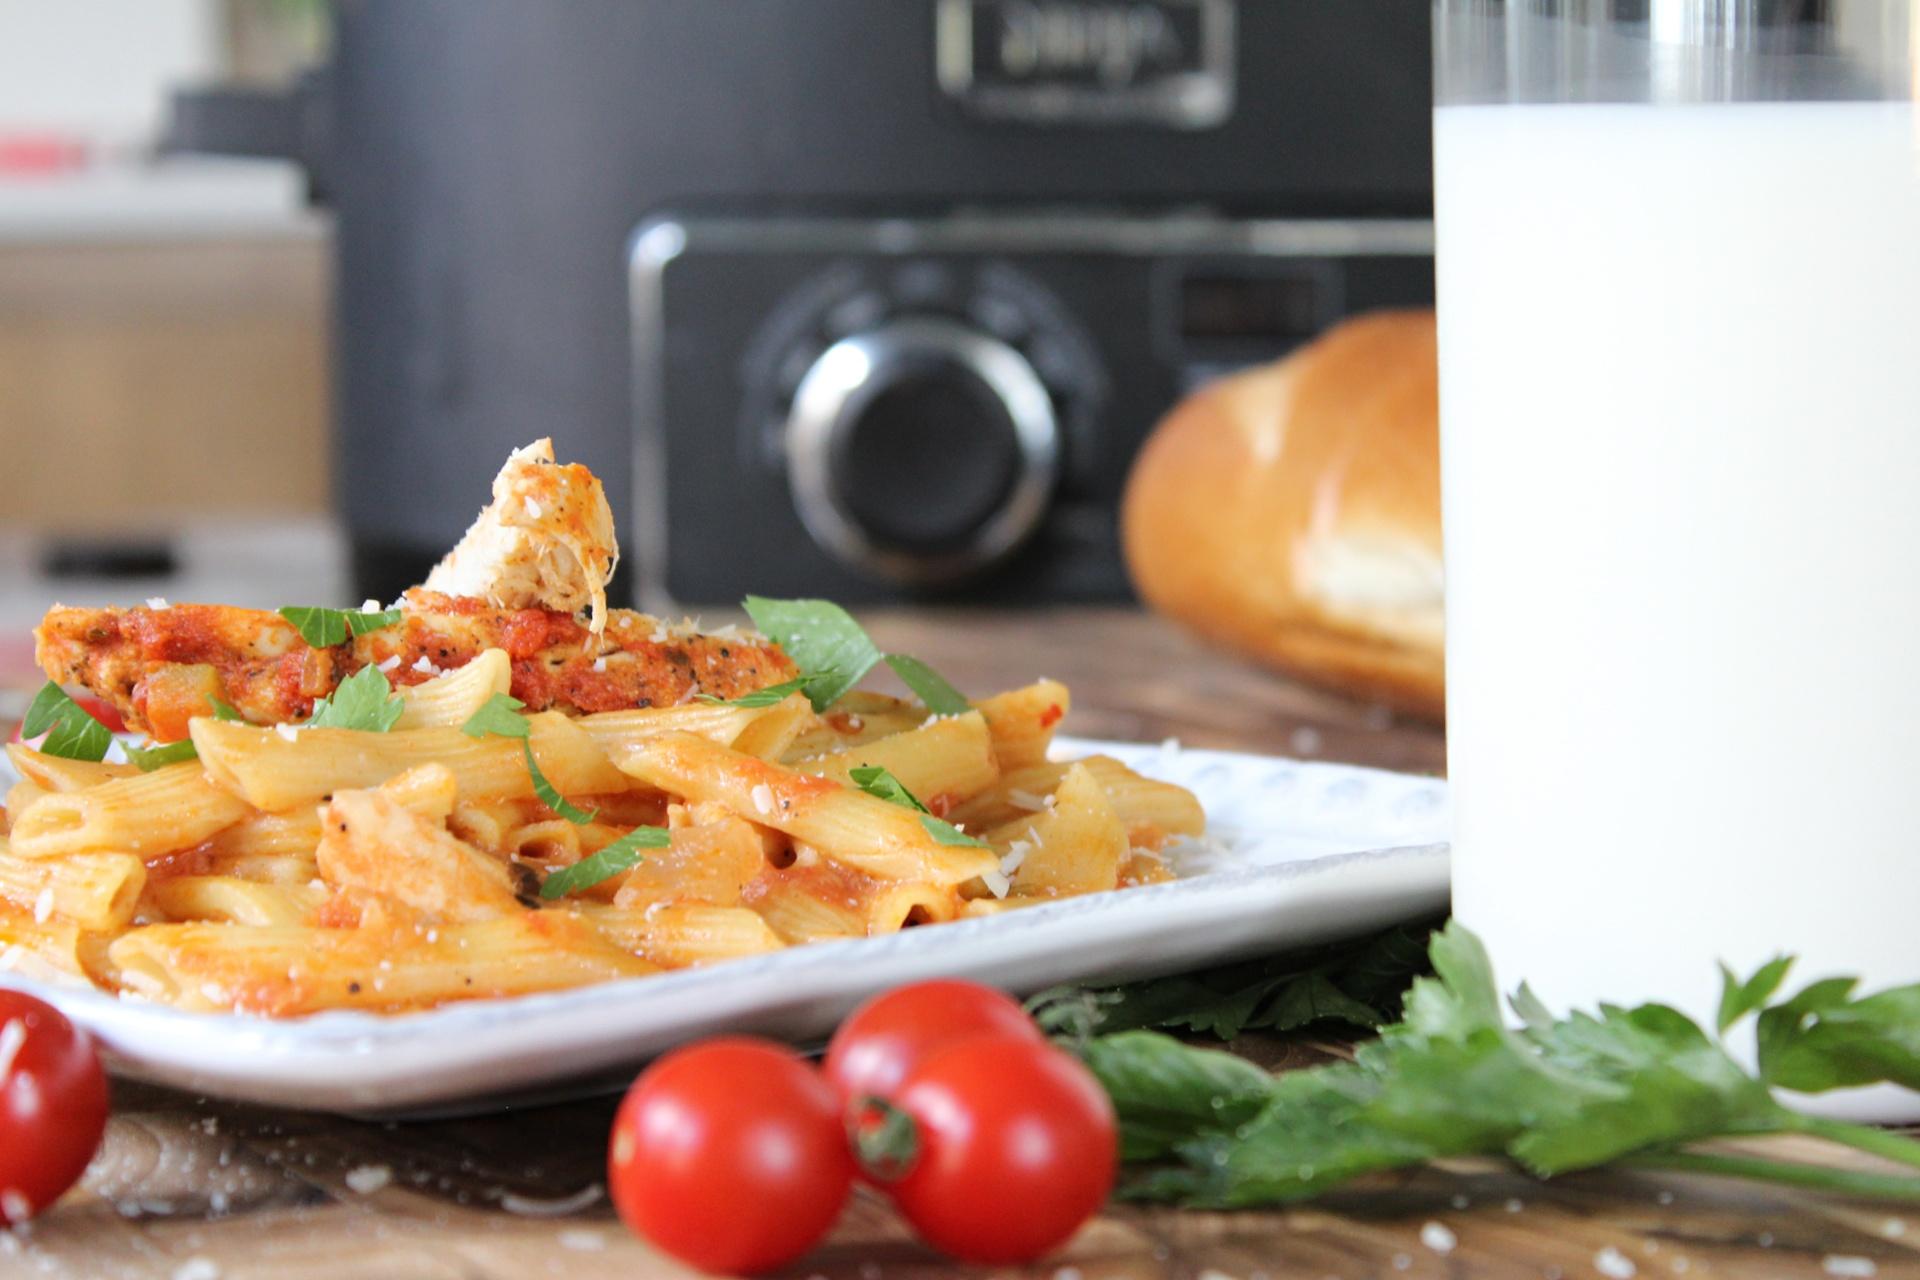 Easy Crockpot creamy chicken pasta